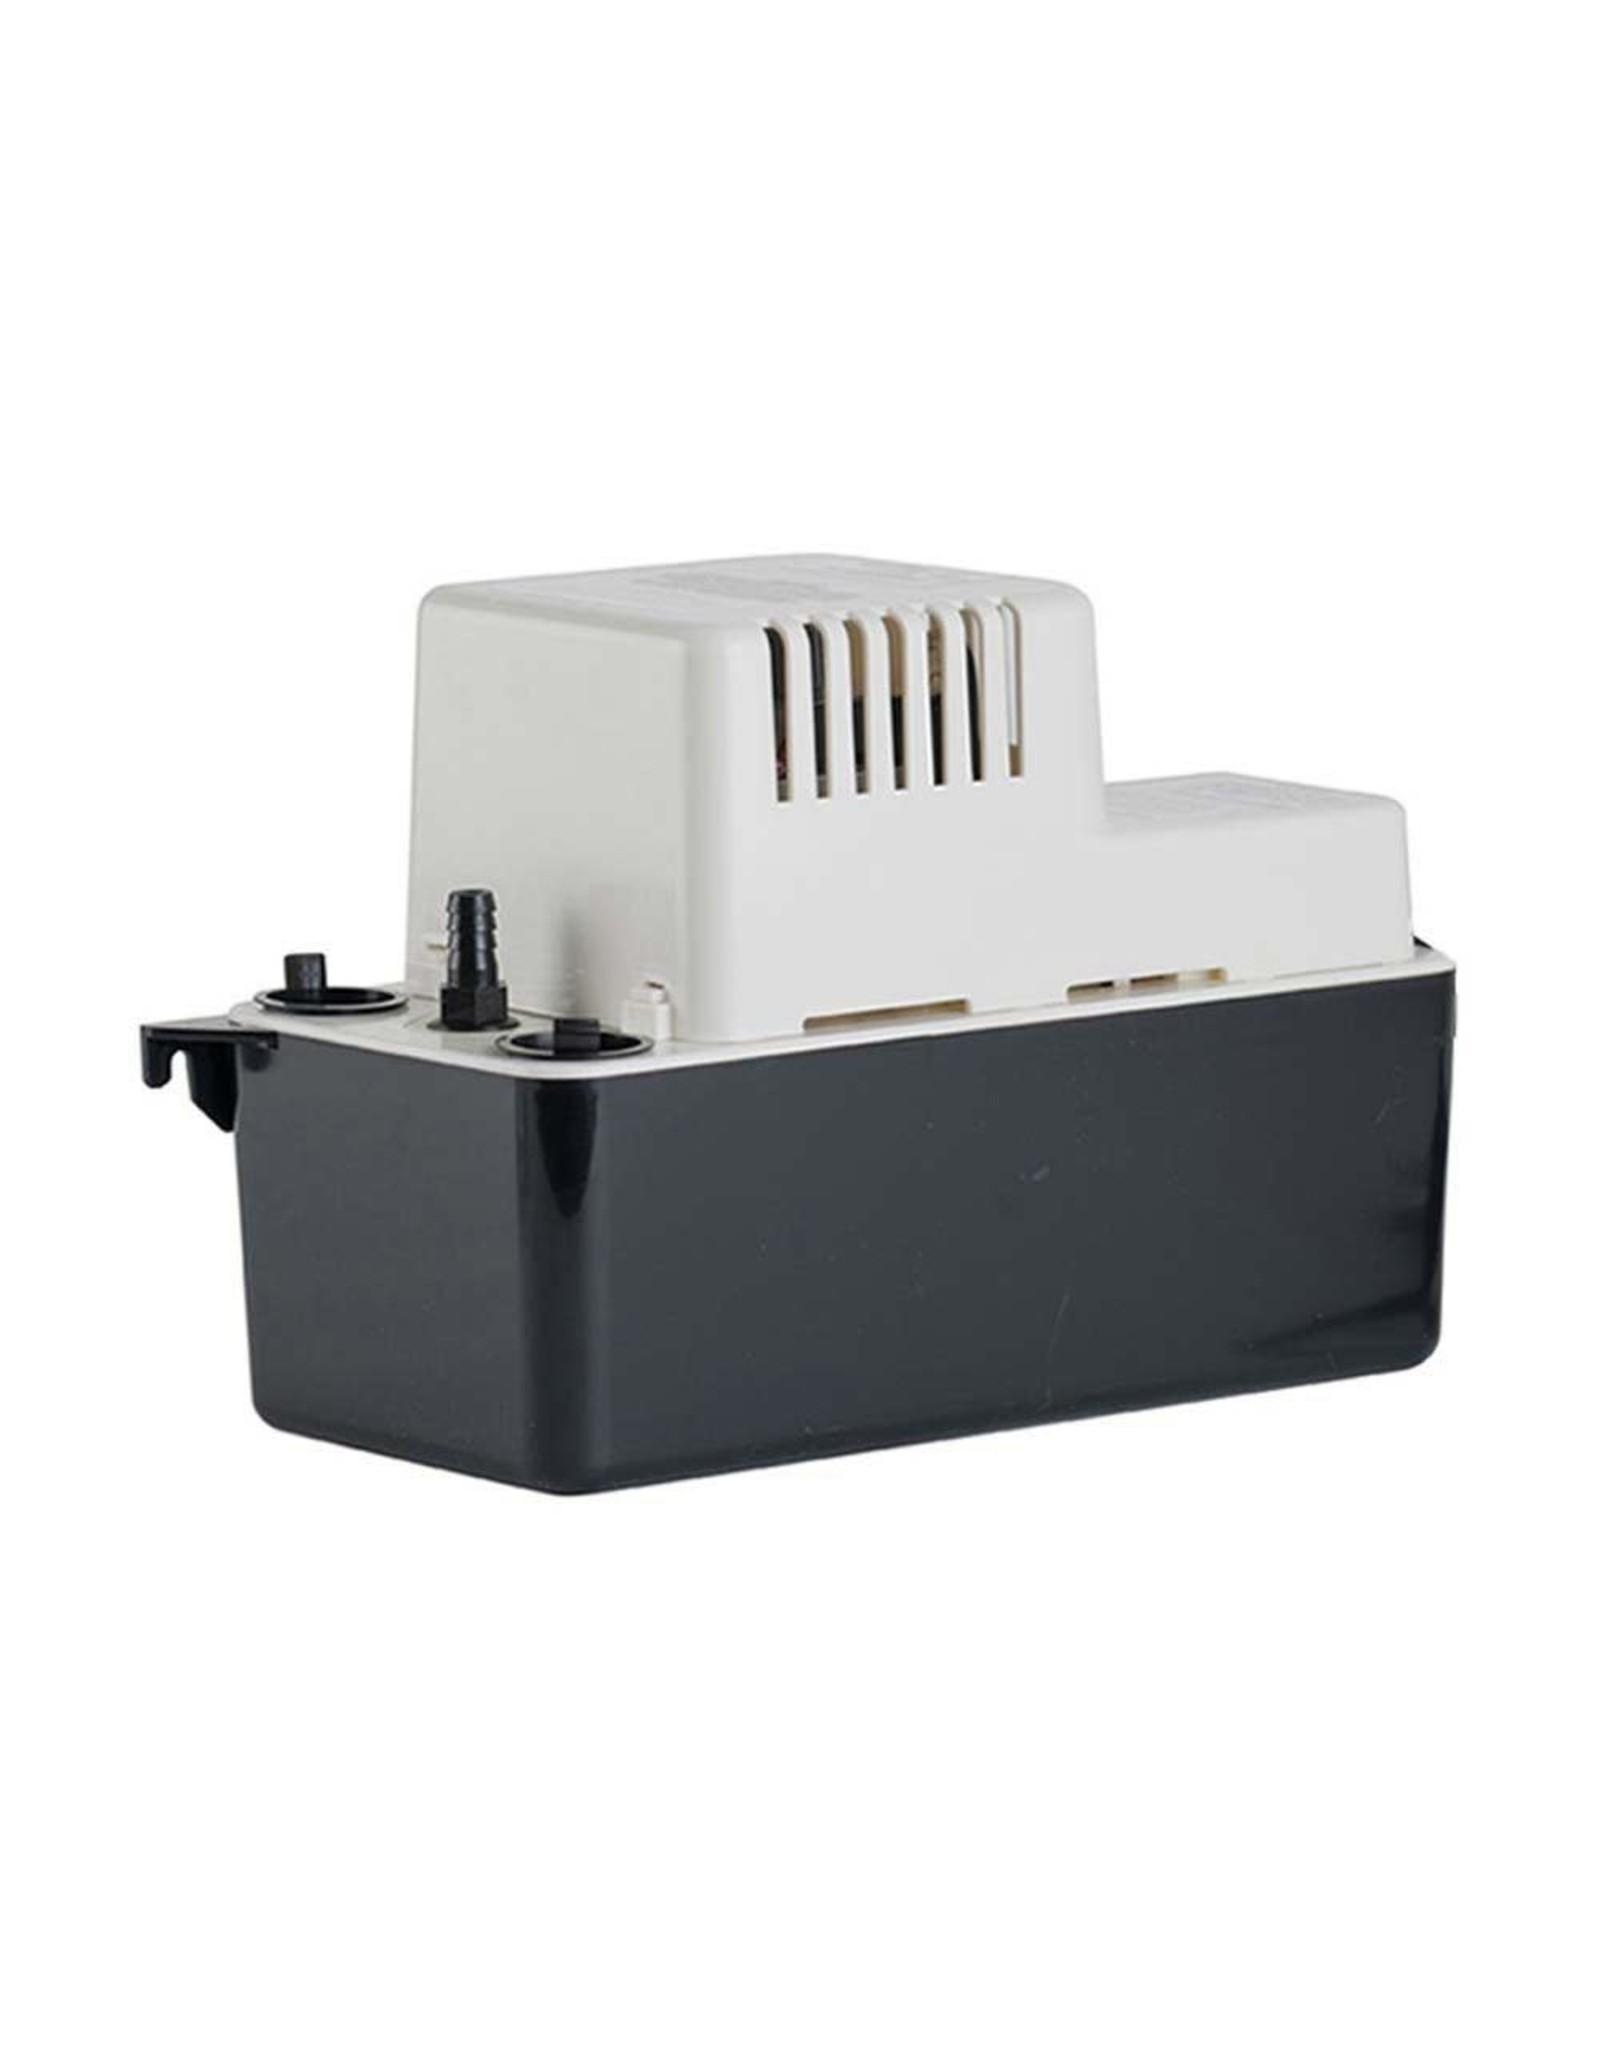 Little Giant Condensate Pump 115v/60hz Little Giant VCMA-20ULS